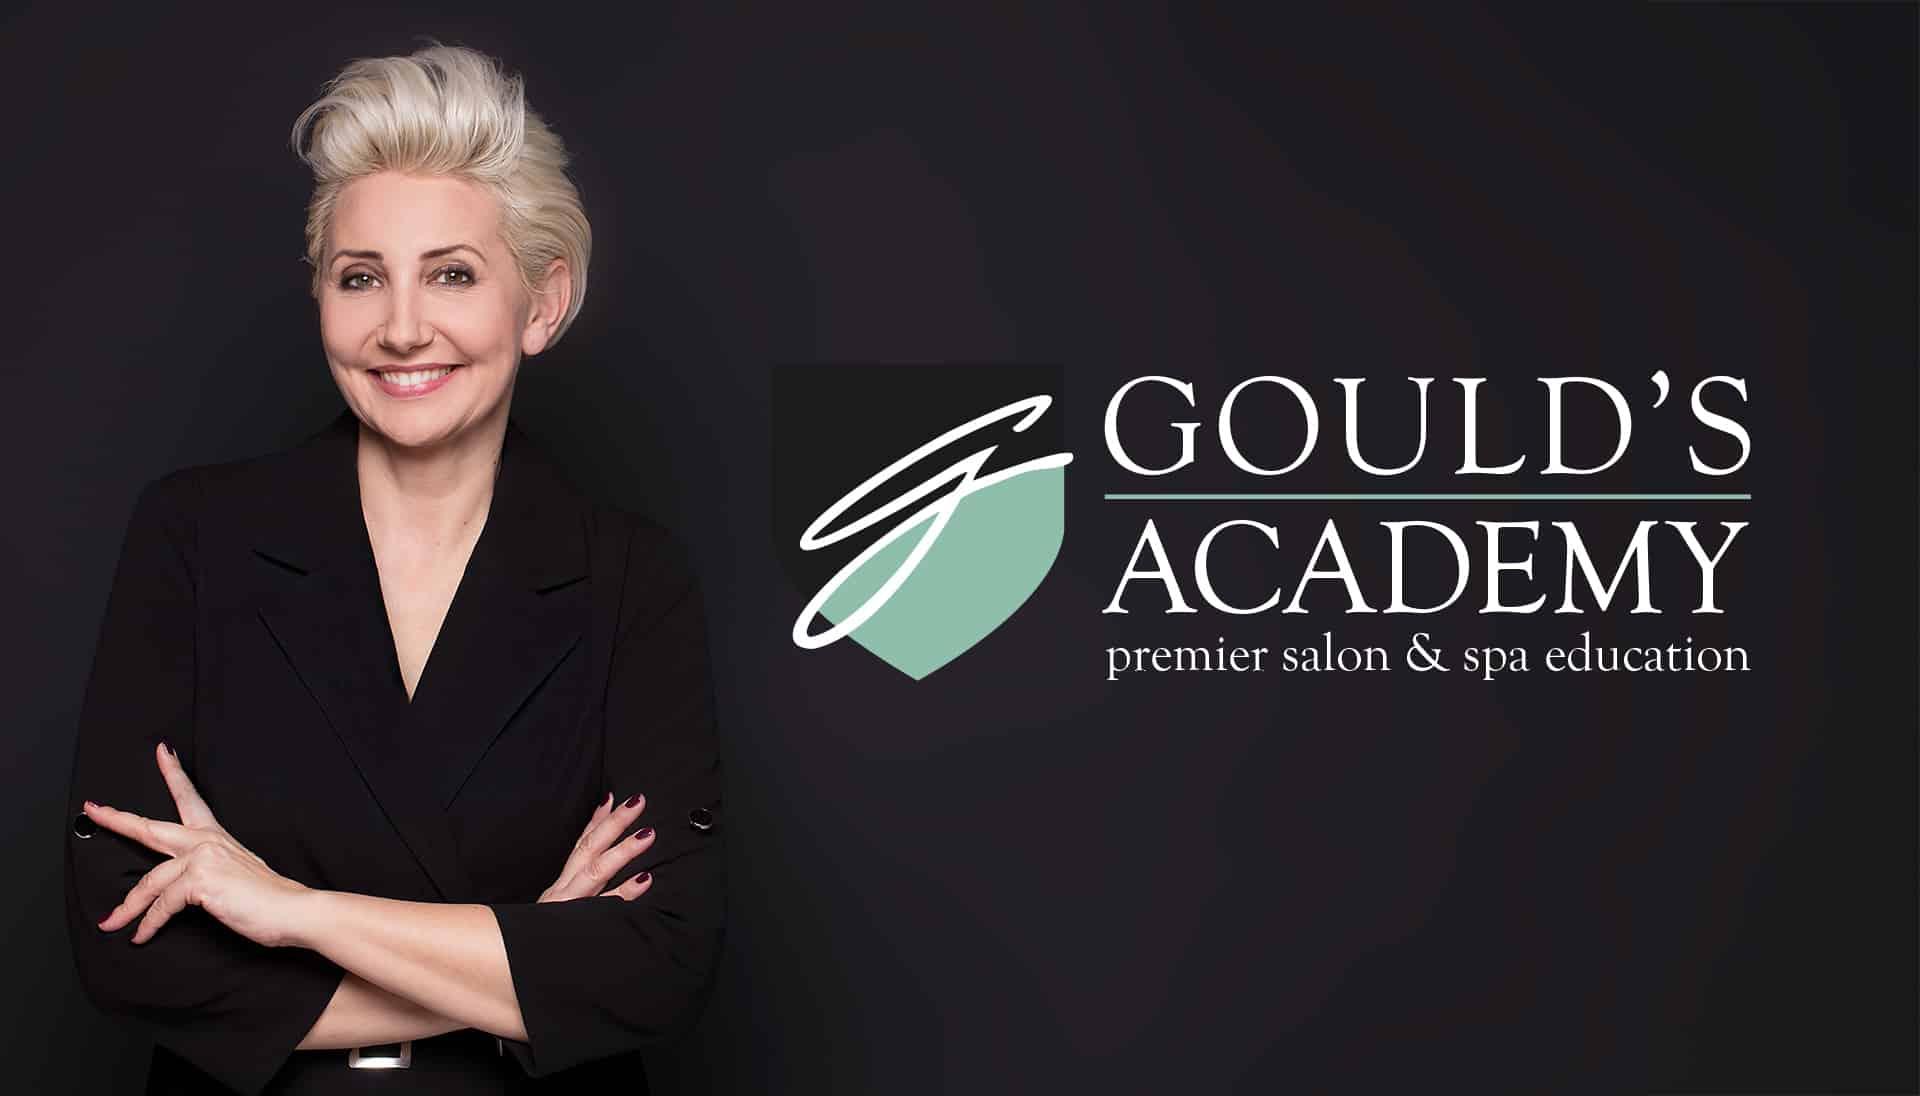 Gould's Academy | Cosmetology, Esthetics, Manicuring, & Beauty School